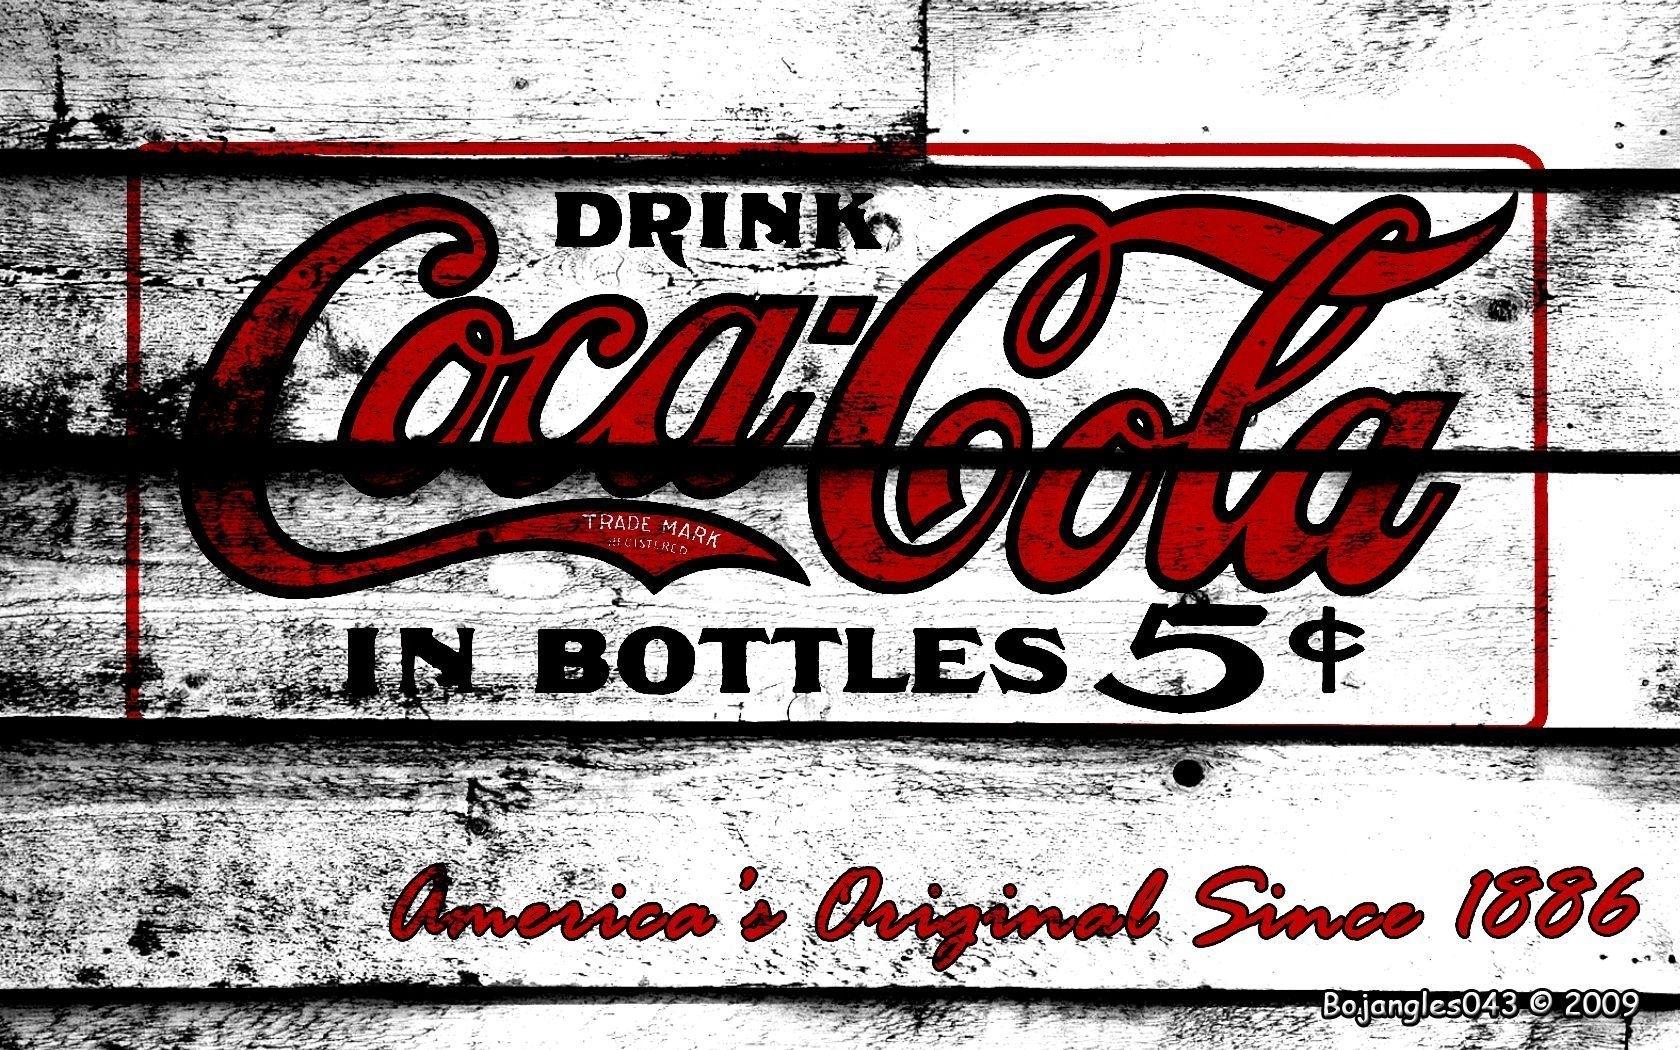 vintage coca cola wallpapers group (68+)